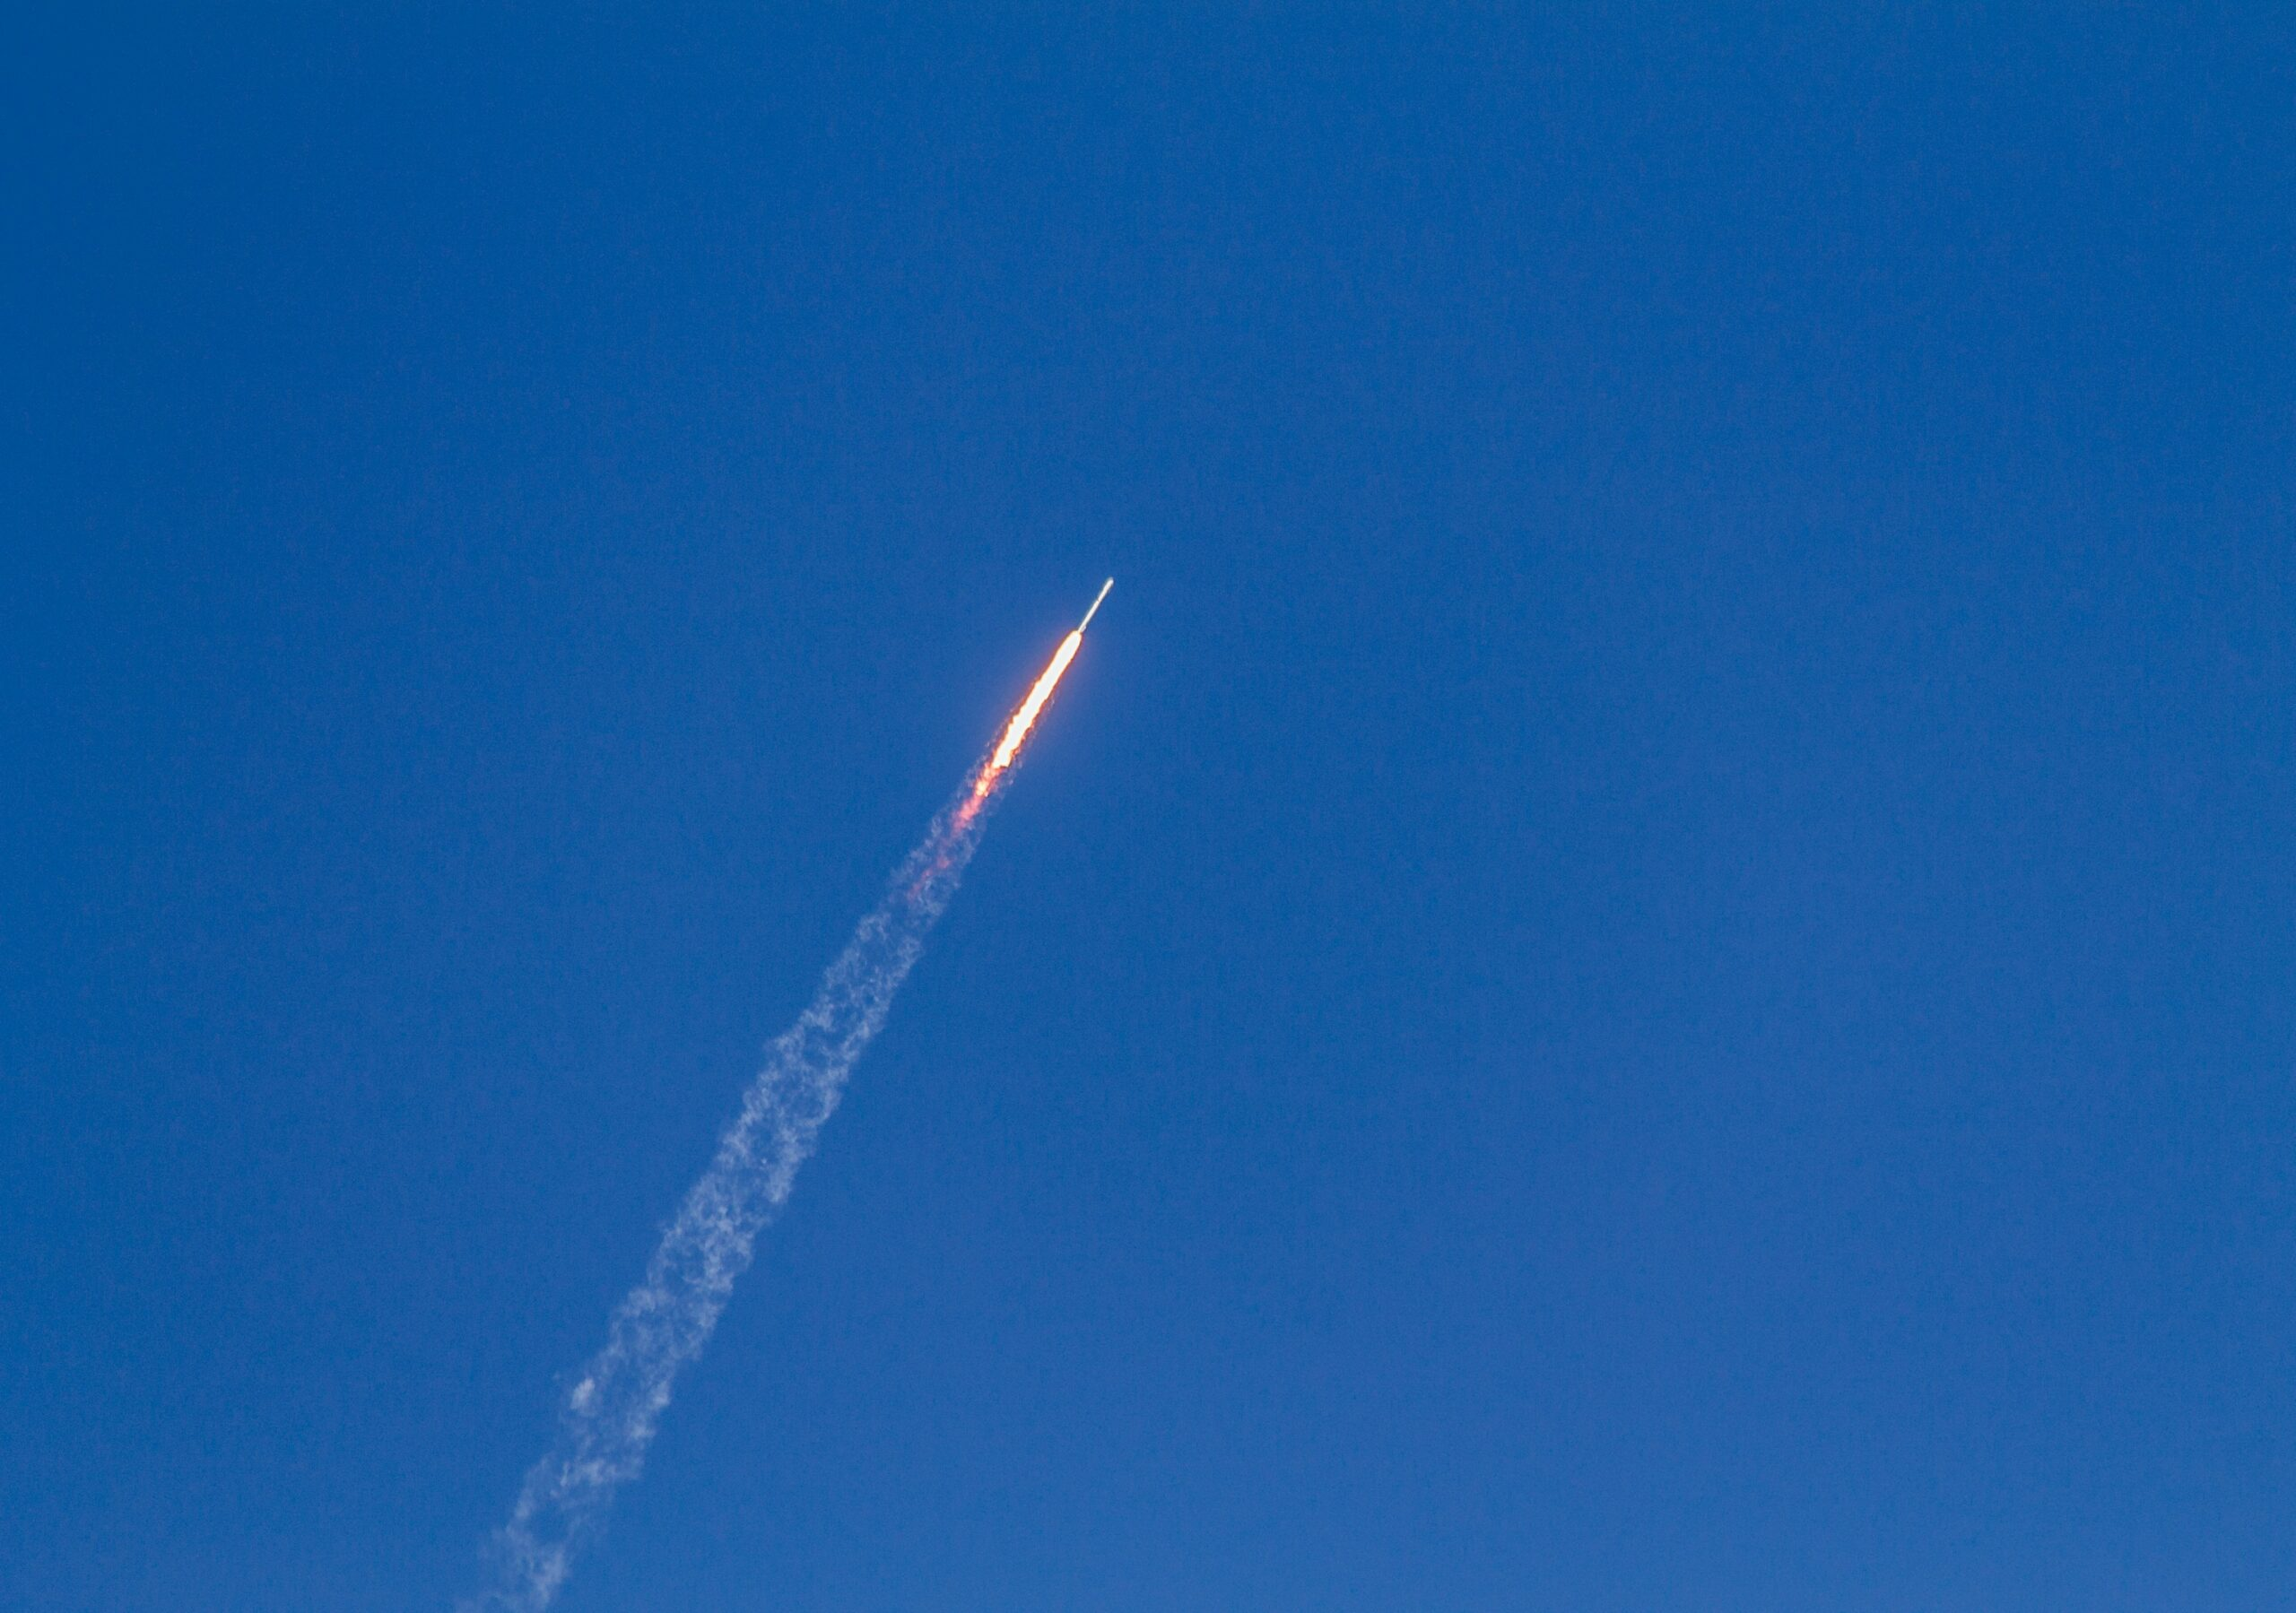 rocket guiding principles value space